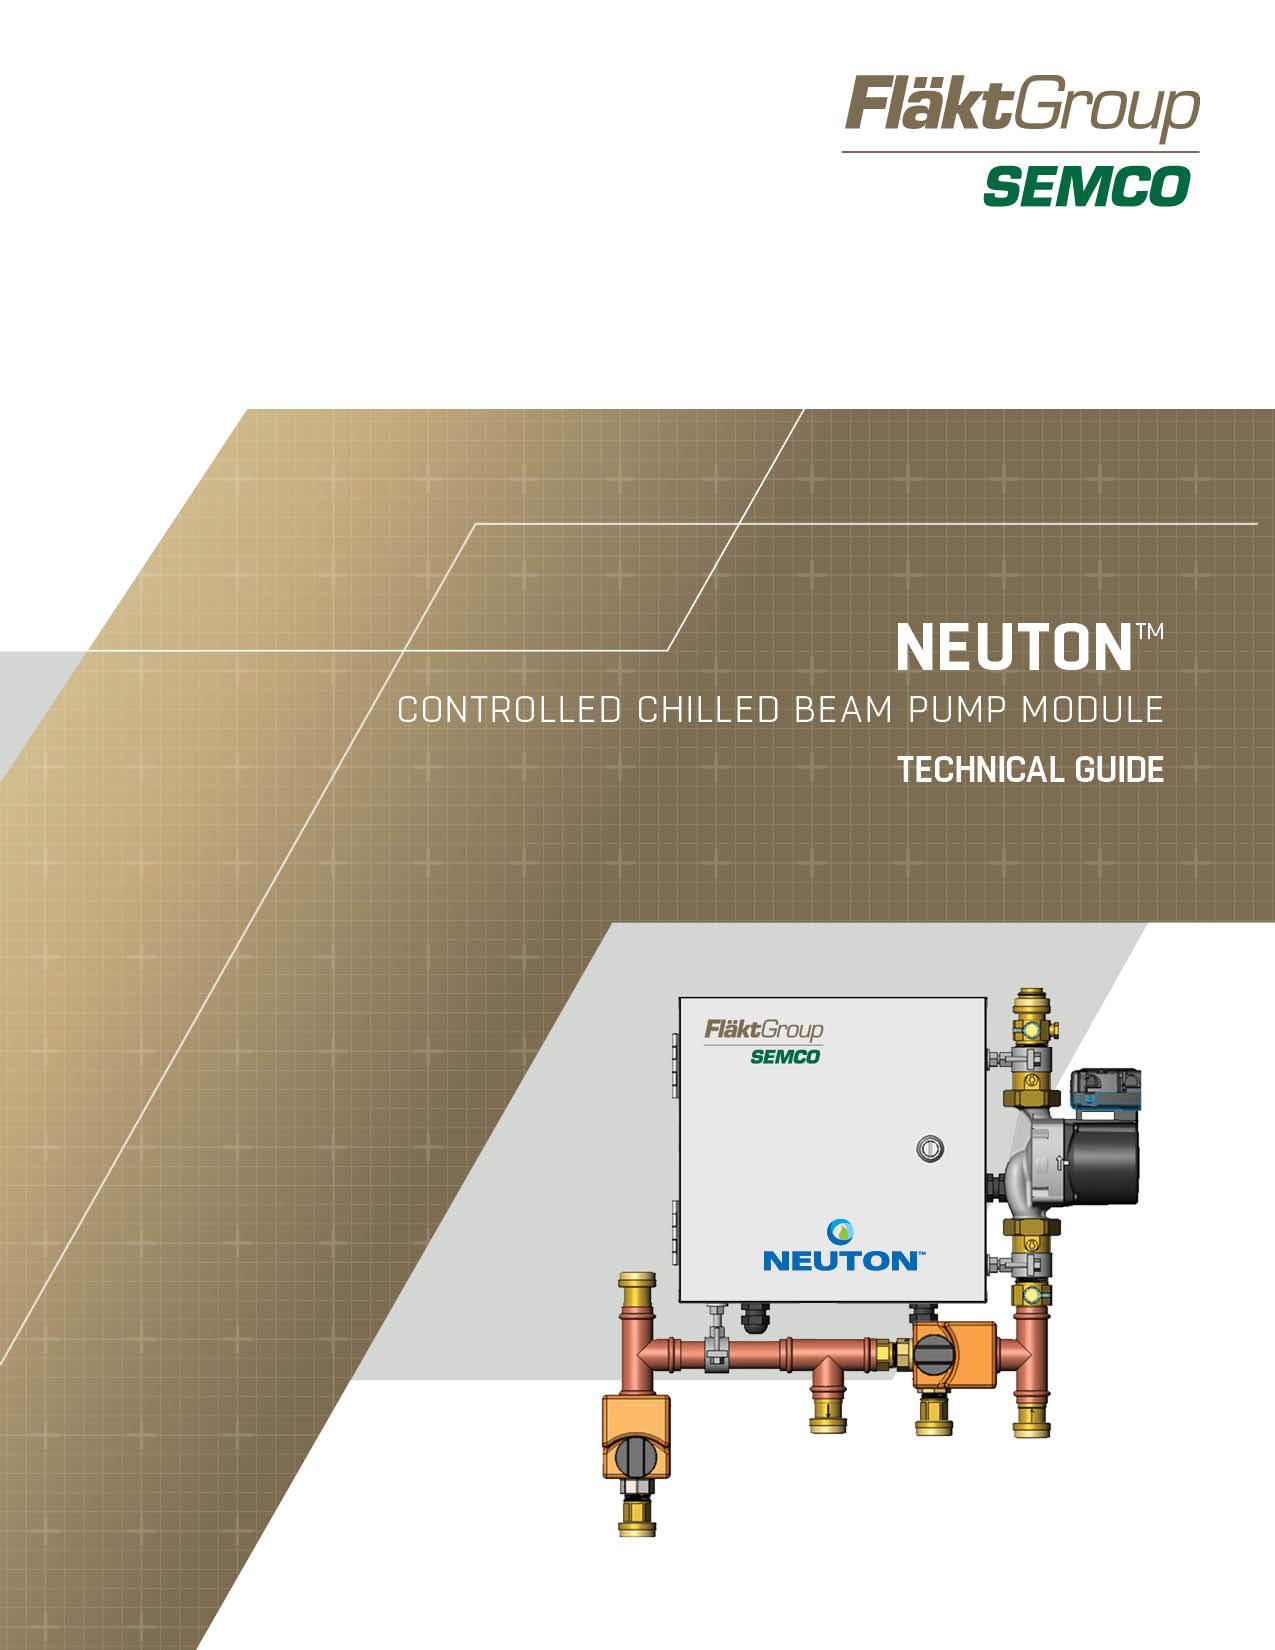 SEMCO_NEUTON_Technical_Guide_Page_01.jpg